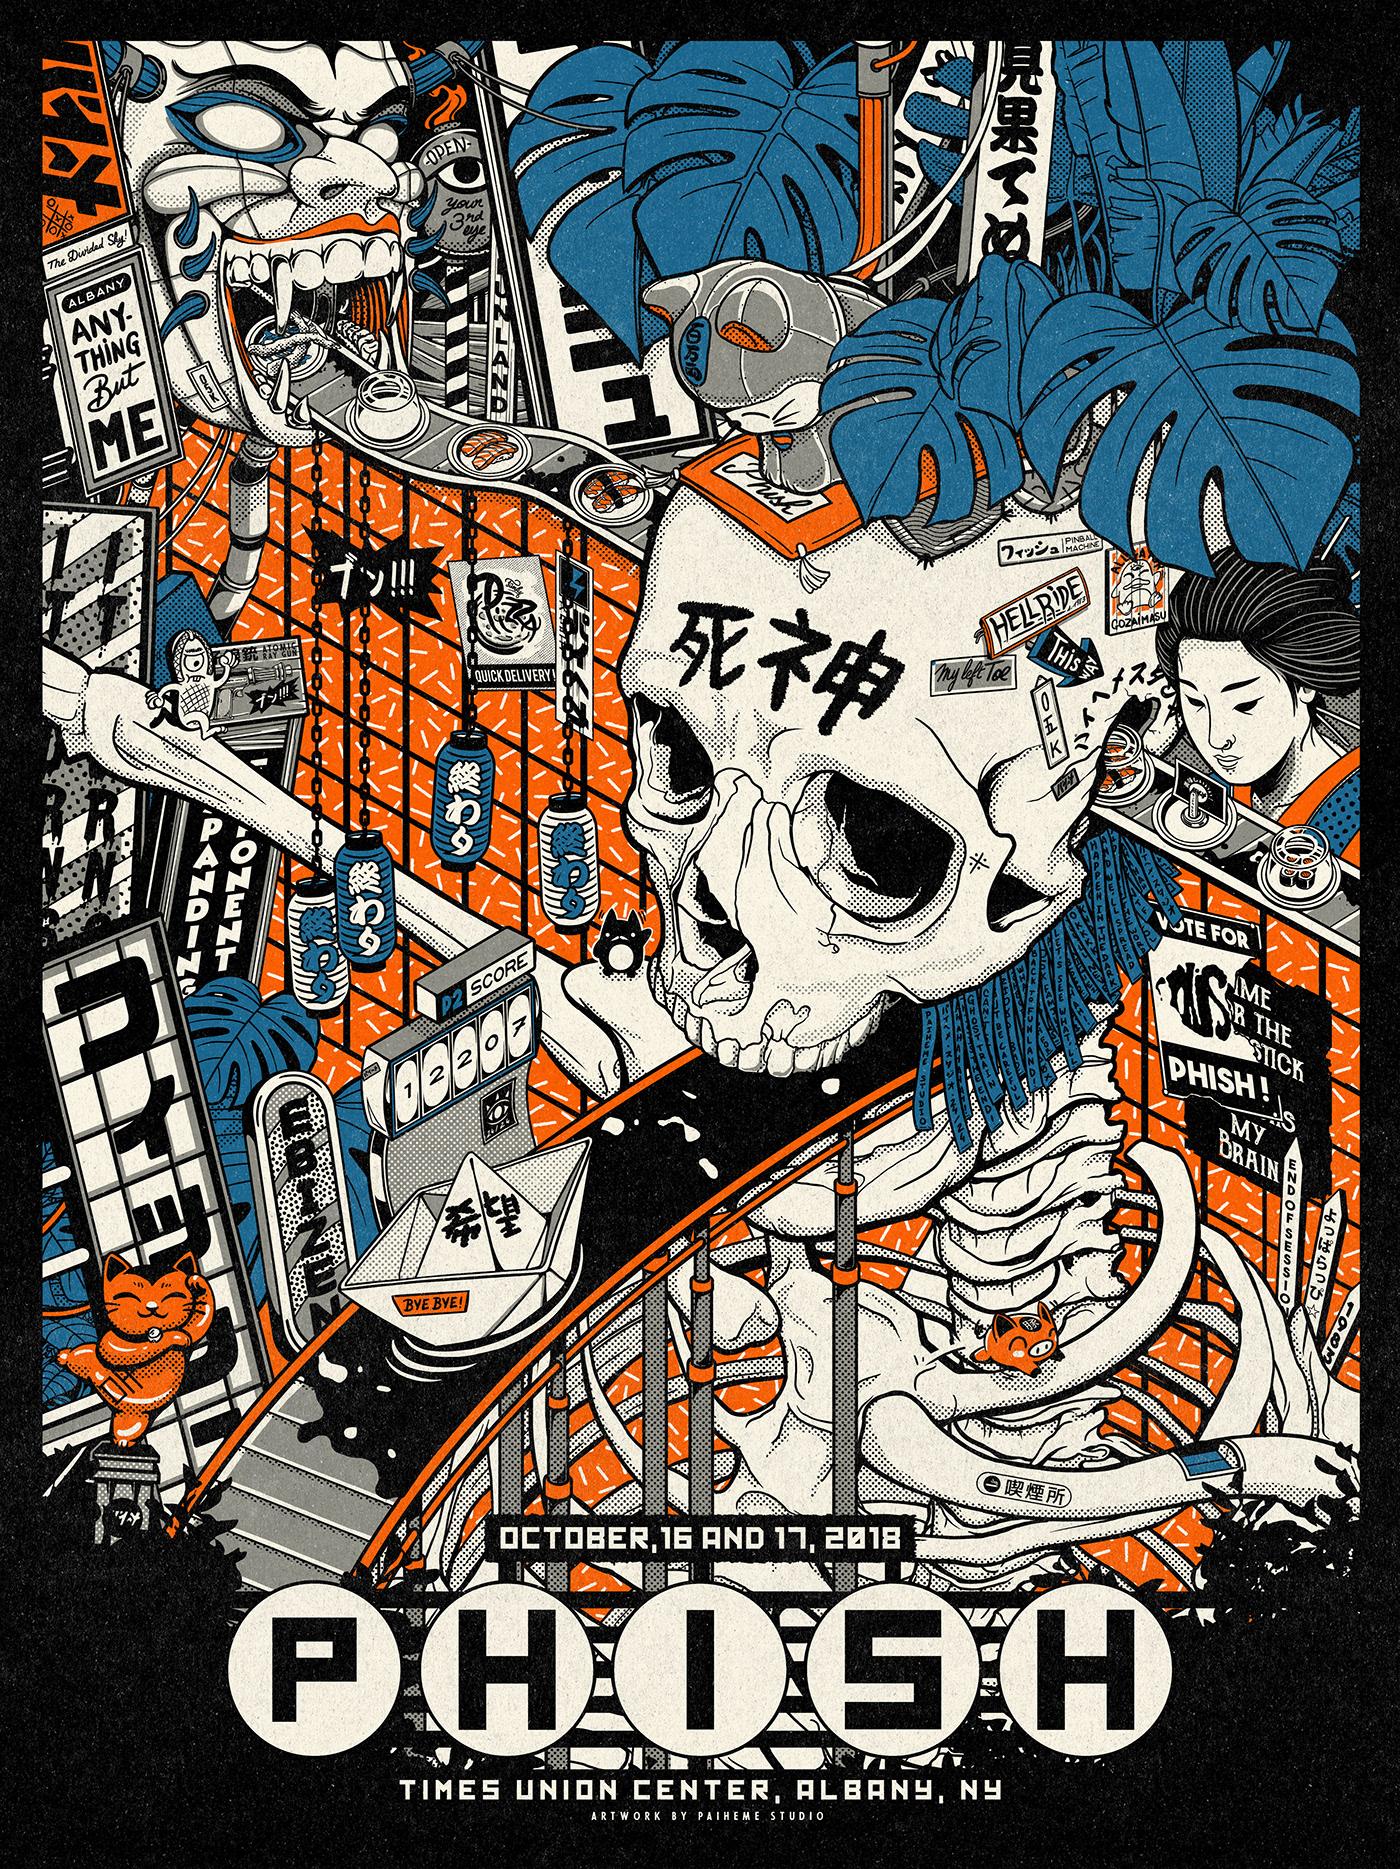 paiheme paihemestudio Phish poster concert vintage japanese graphism ILLUSTRATION  print japan